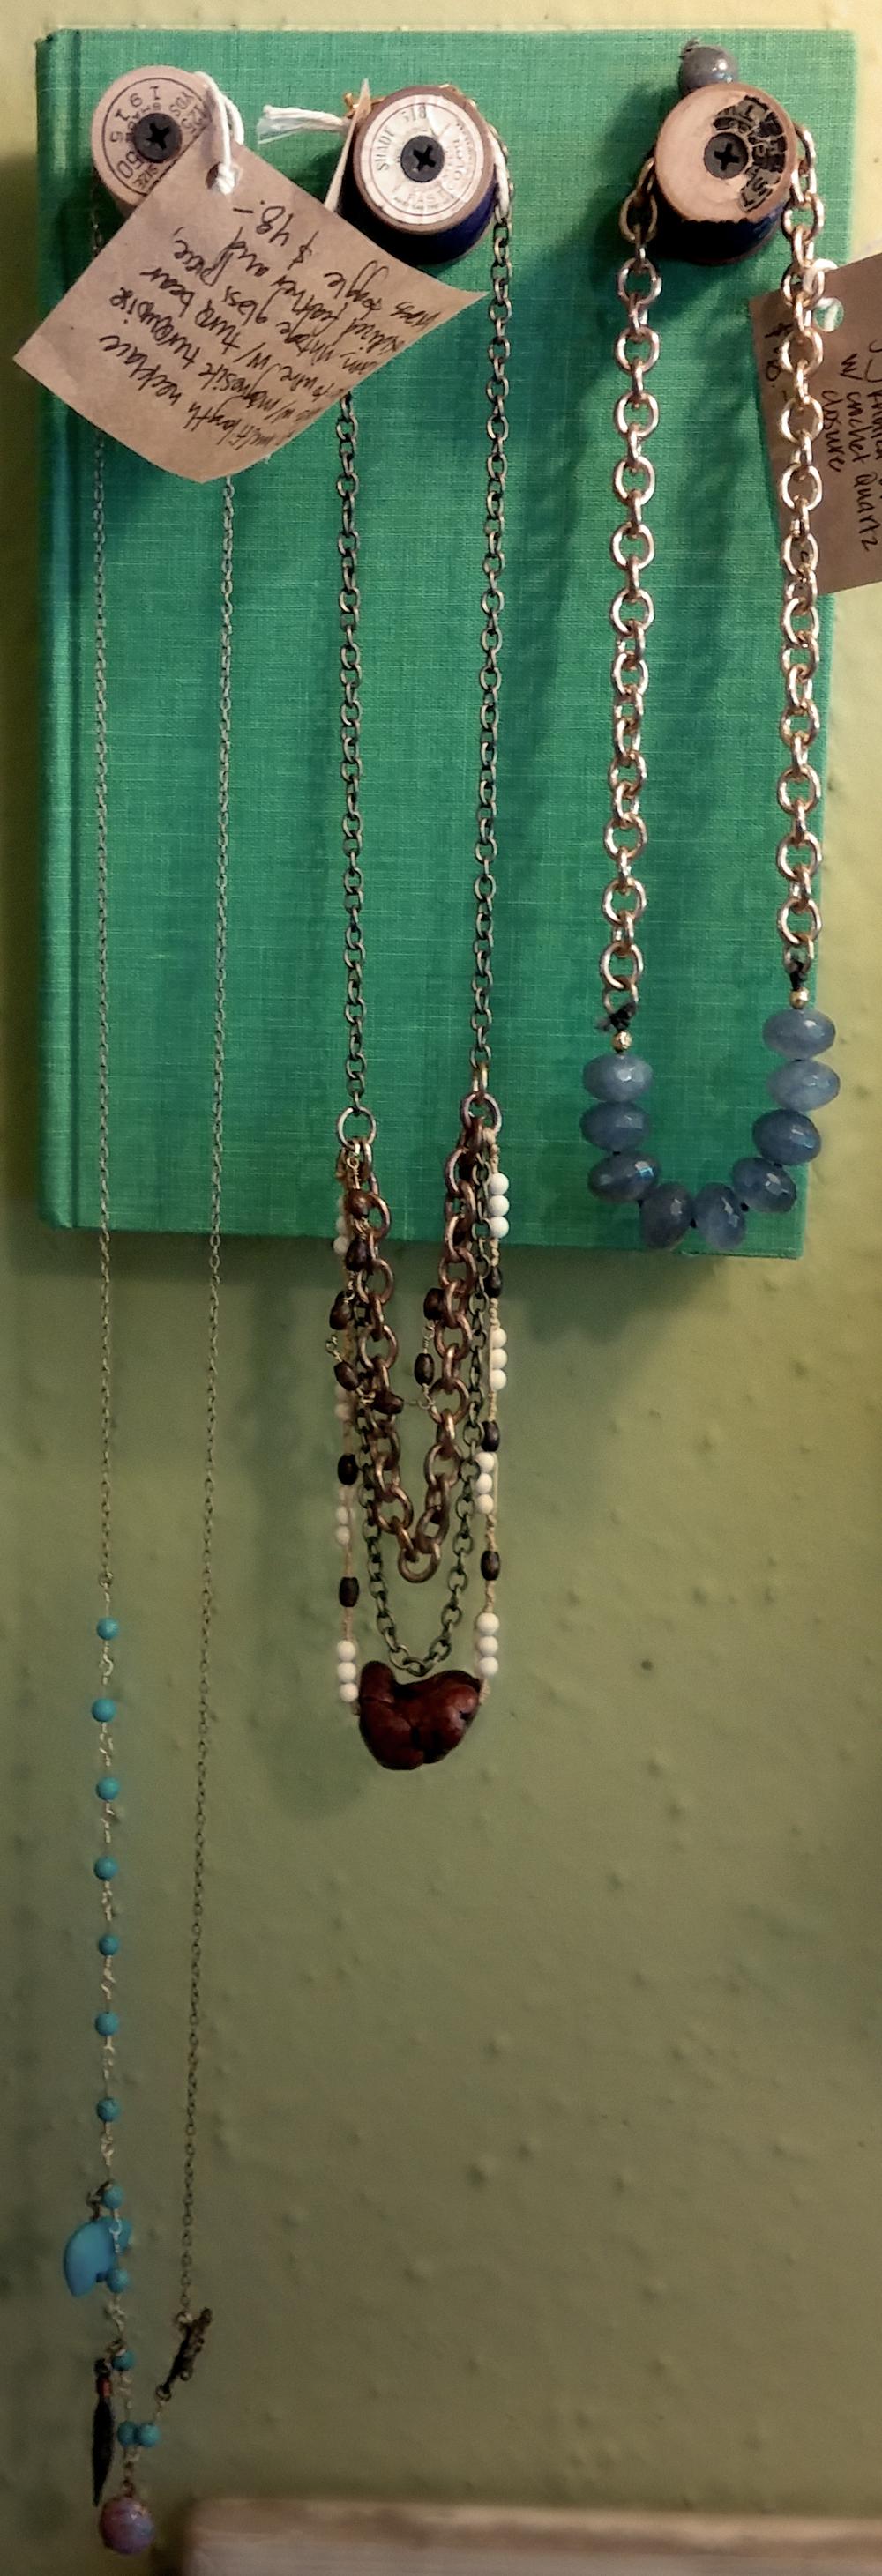 necklaces by Stephanie Deleonardis instagram @deleonartist